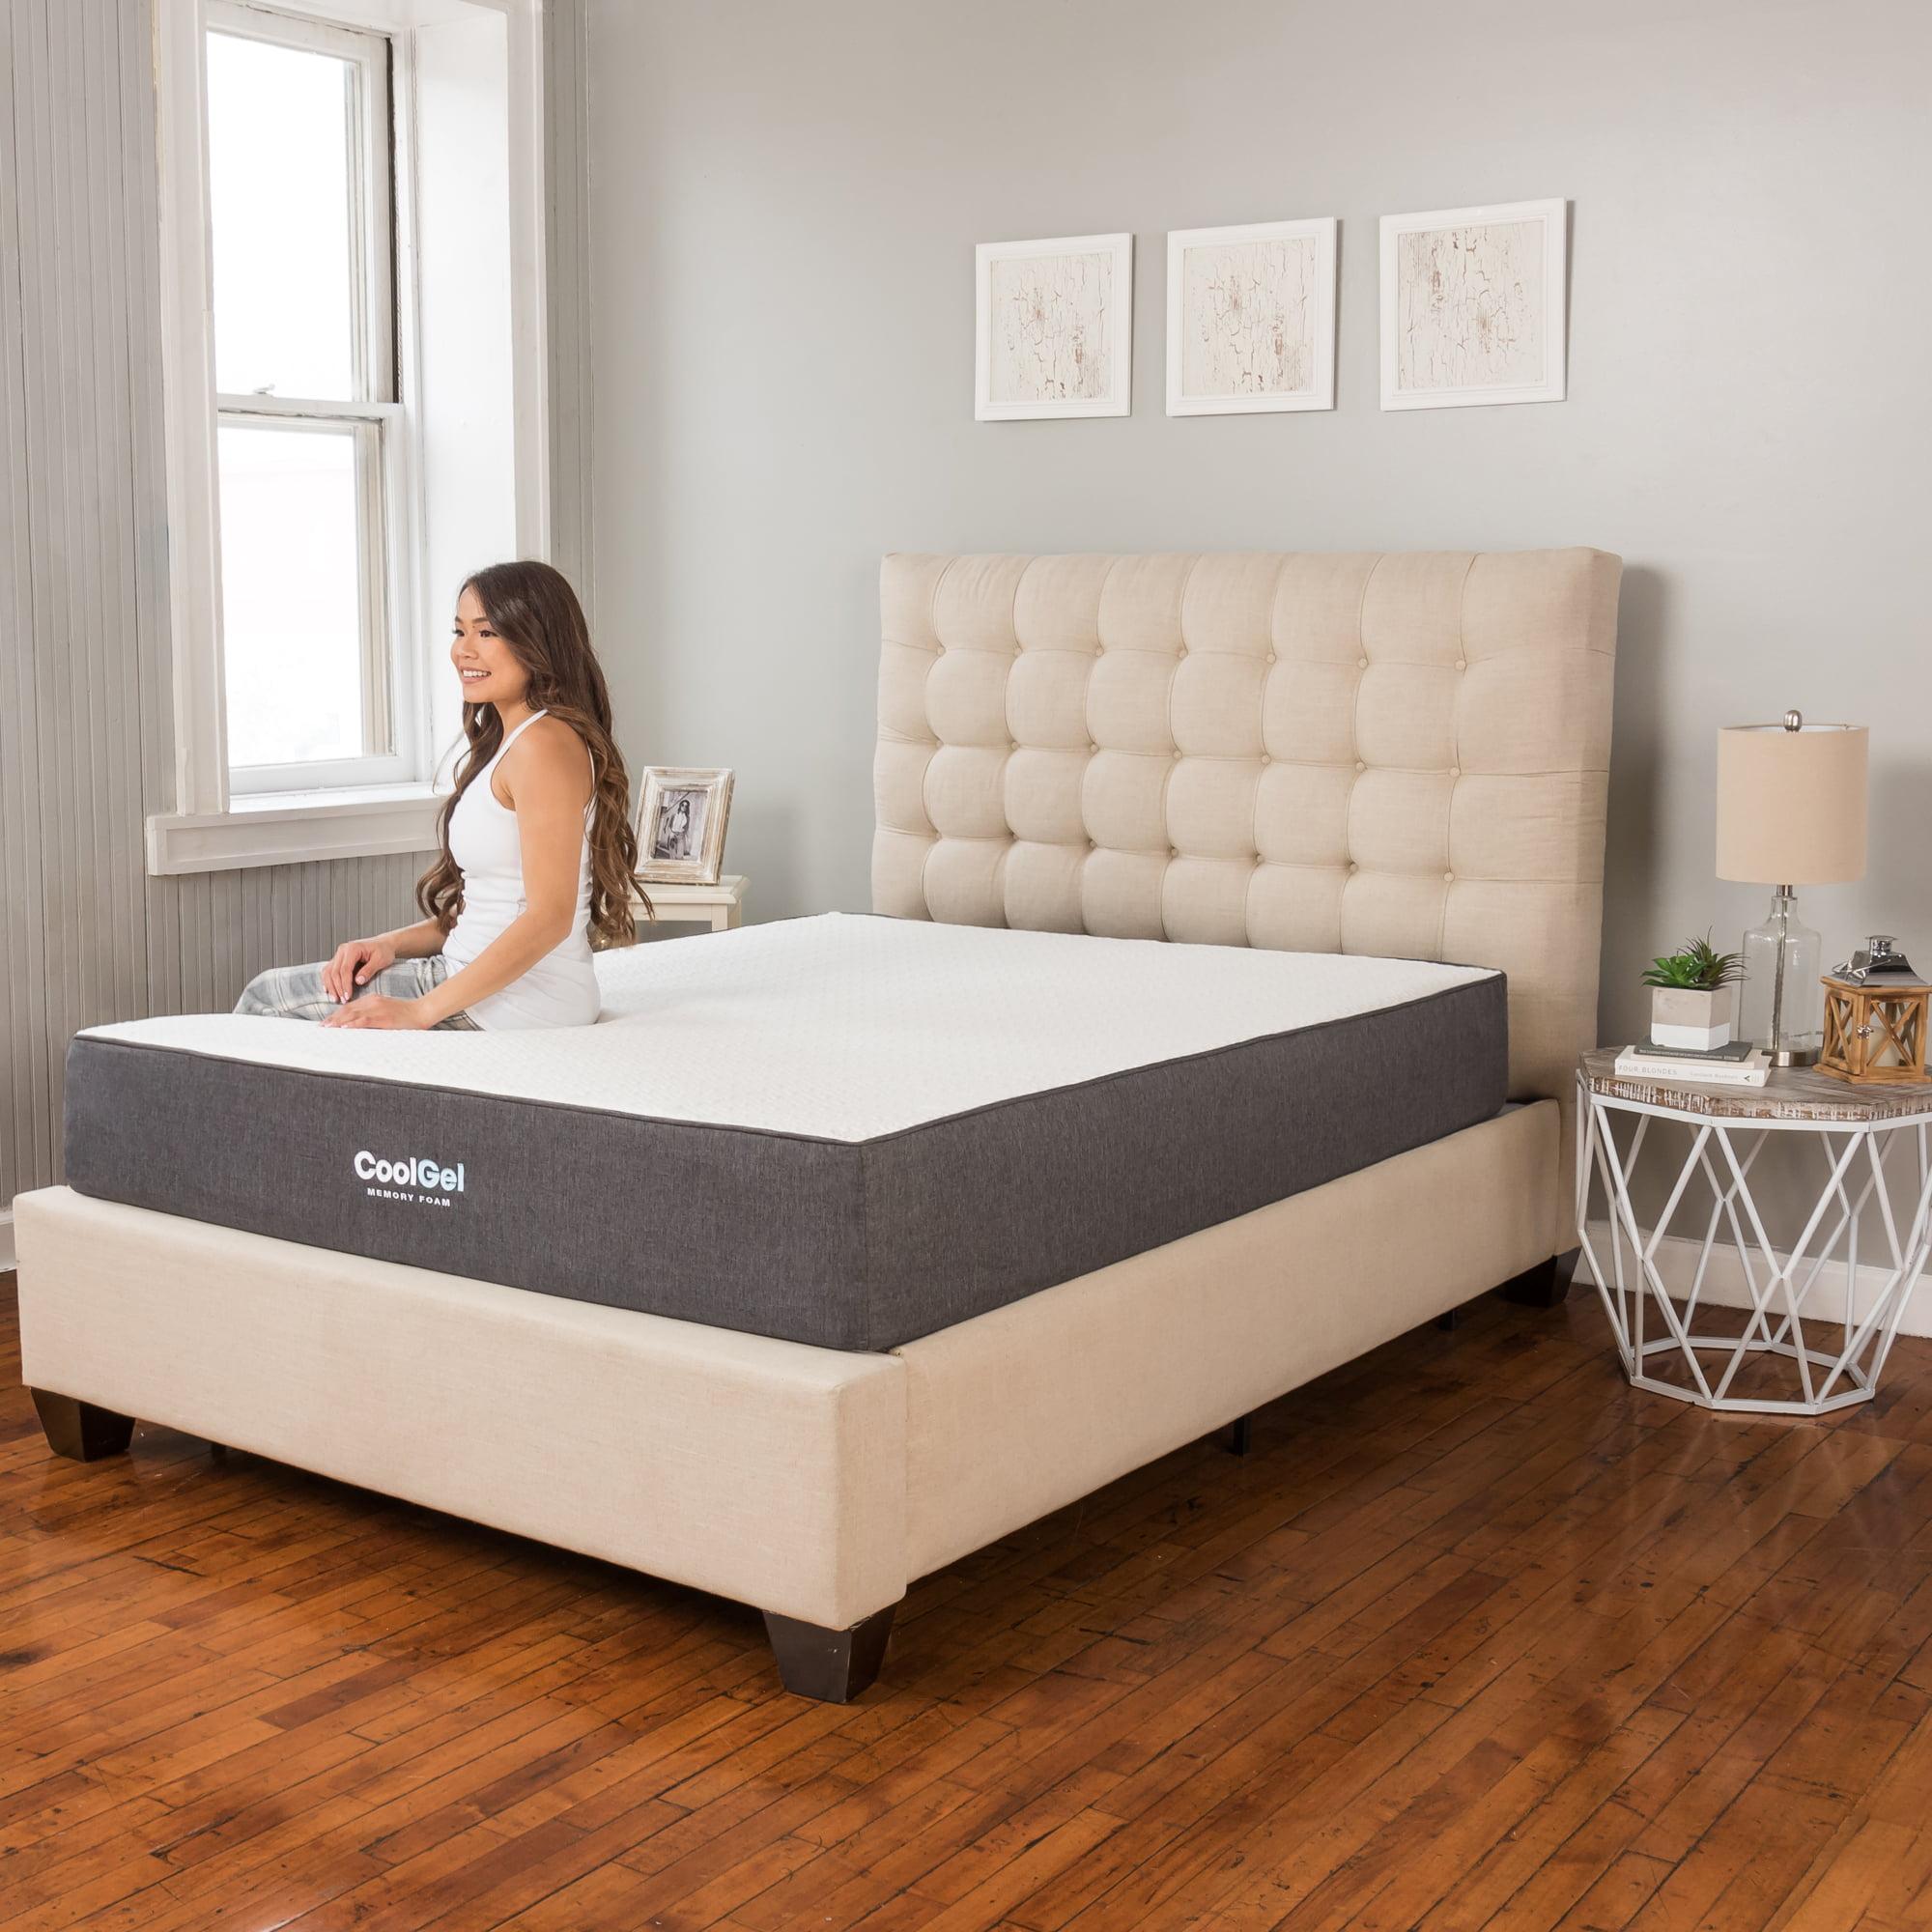 Modern Sleep Cool Gel Ventilated Gel Memory Foam 10.5-Inch Mattress with  BONUS Conforma Memory Foam Pillow - Walmart.com